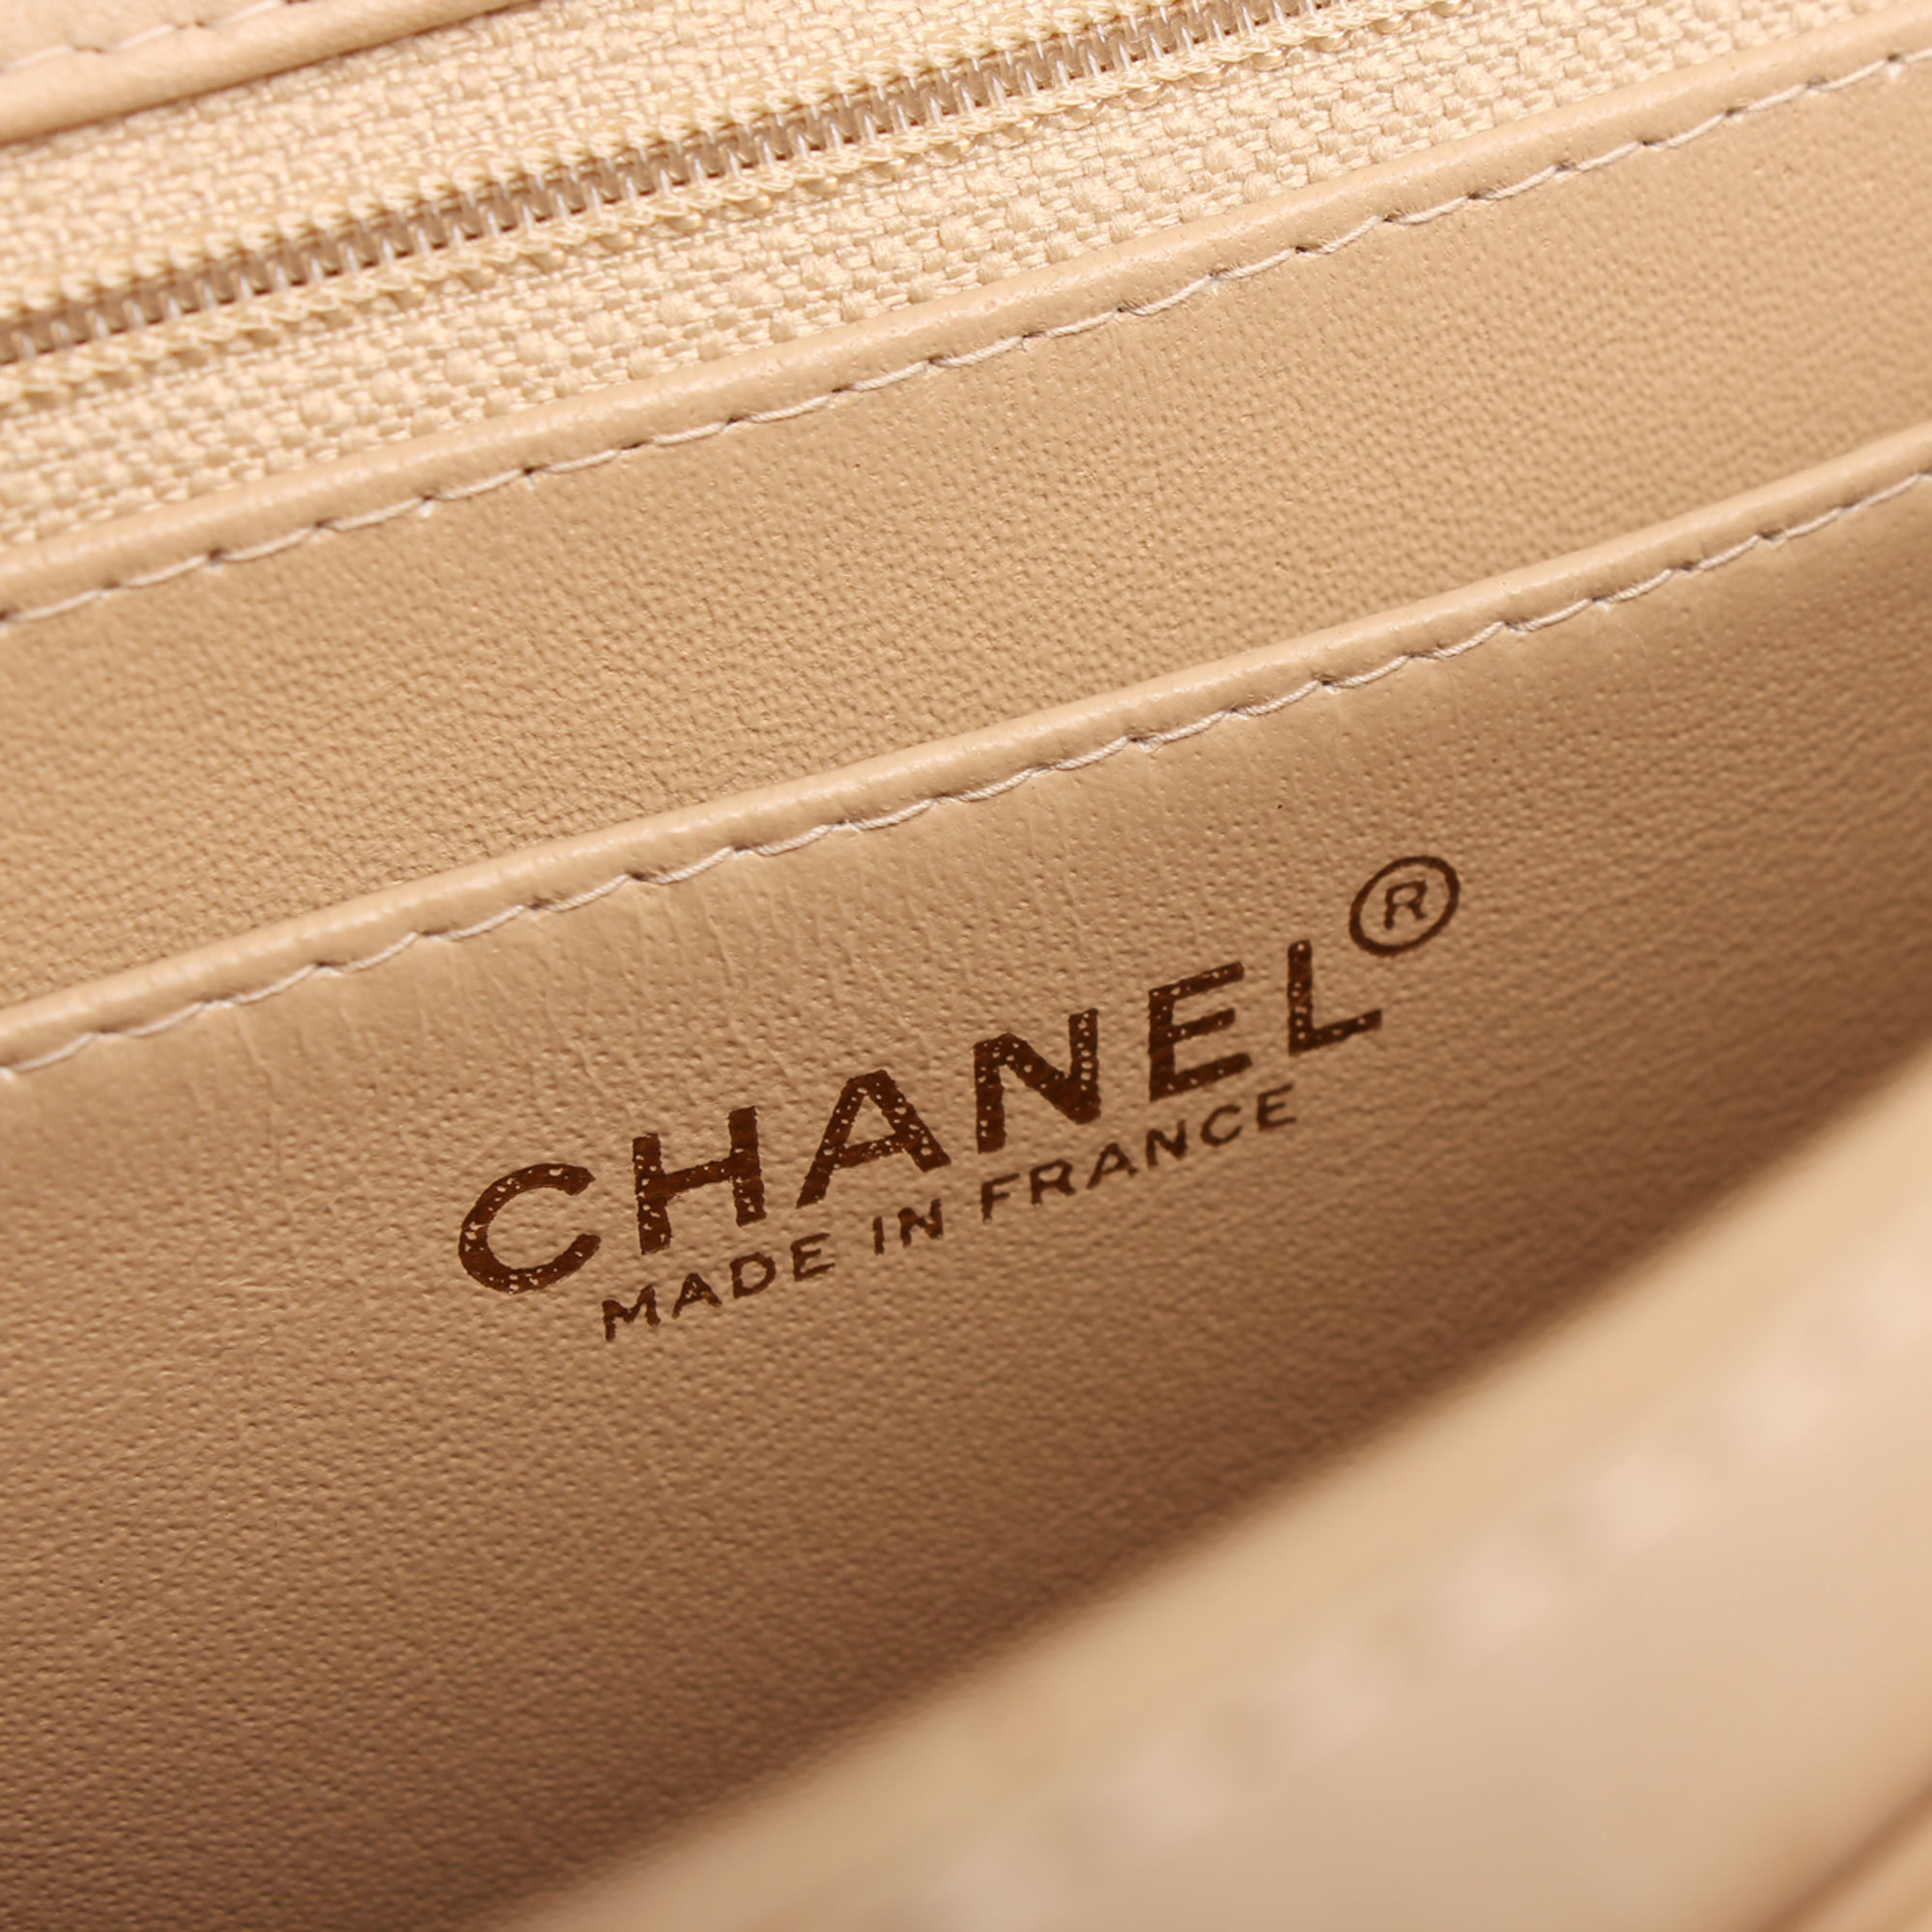 Imagen de la firma del bolso chanel bicolor choco bar solapa unica